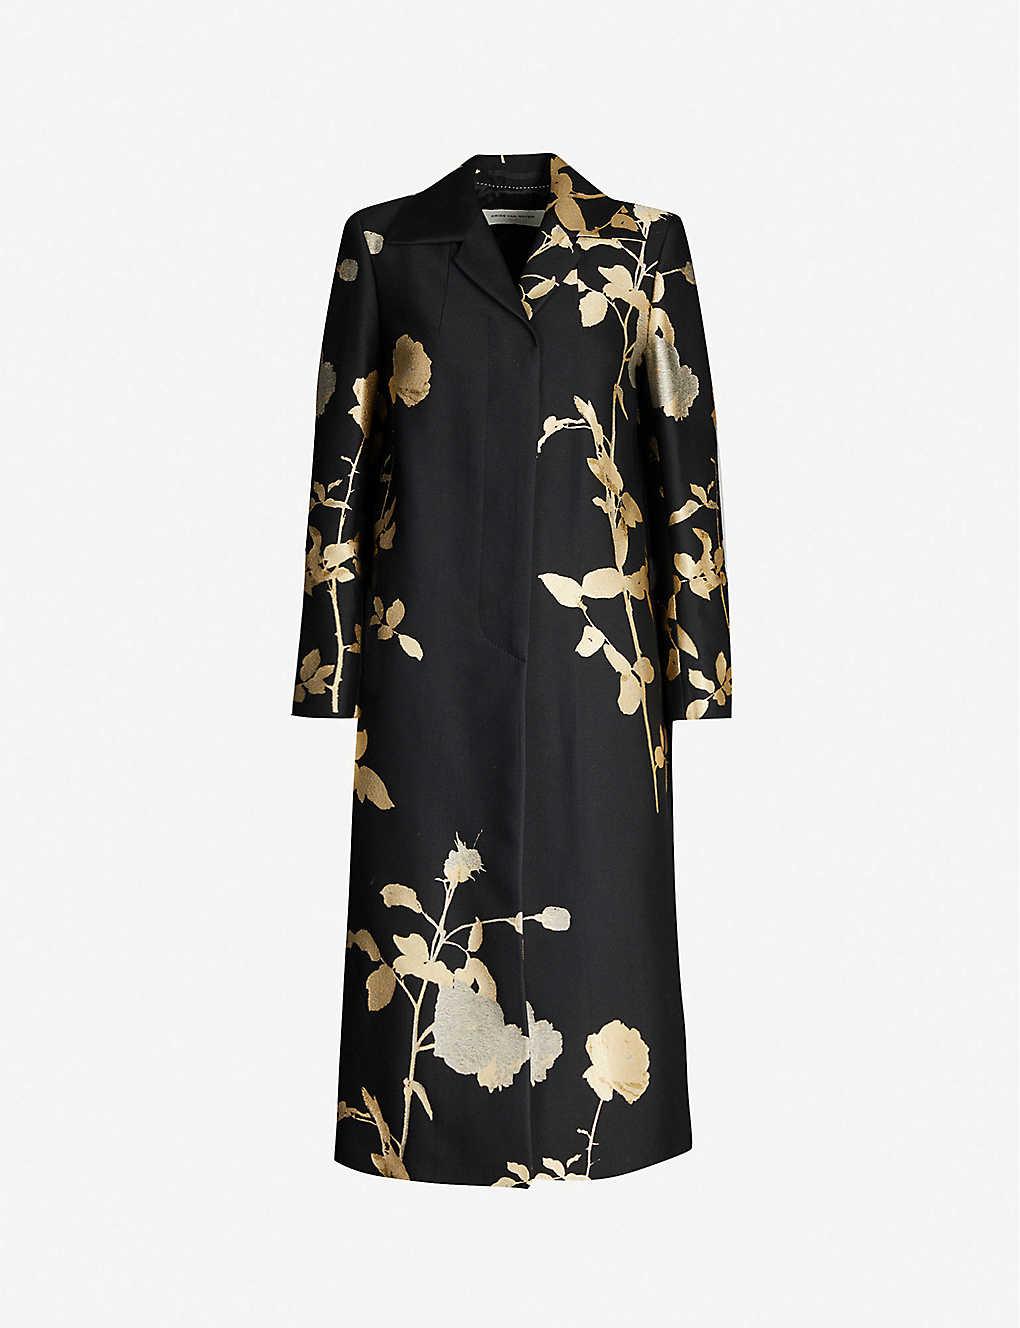 Dries Van Noten Coats Metallic floral-pattern woven-jacquard coat